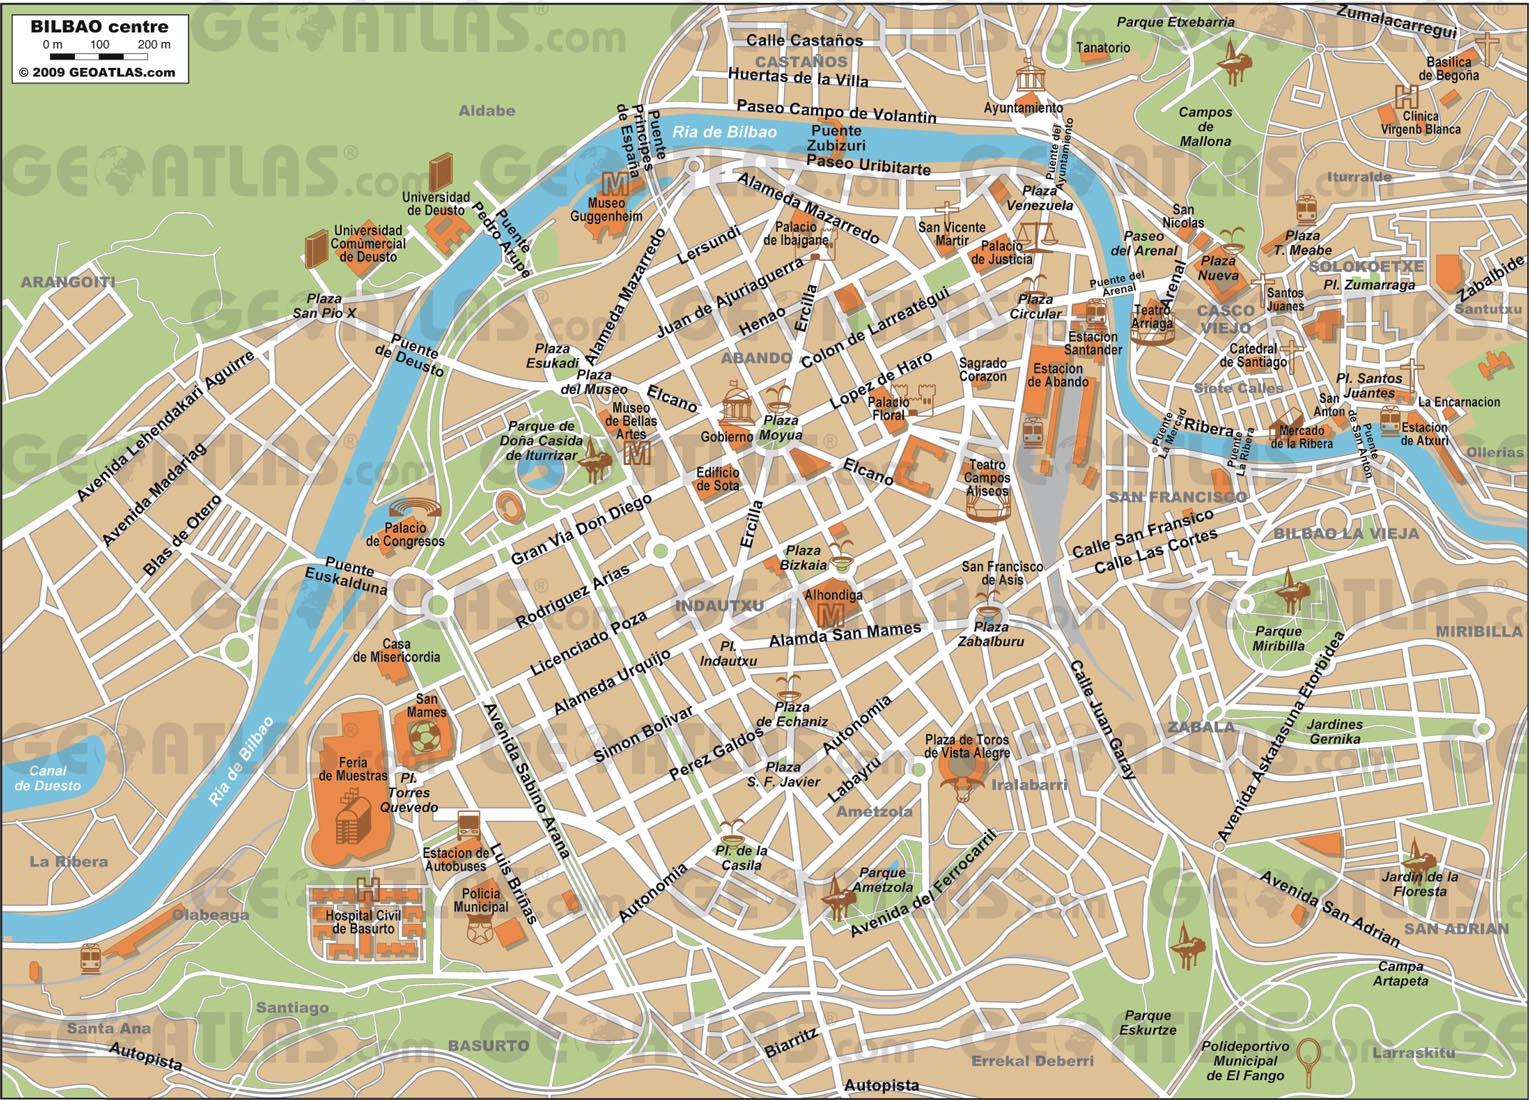 bilbao espanha mapa Mapas de Bilbao   Espanha | MapasBlog bilbao espanha mapa